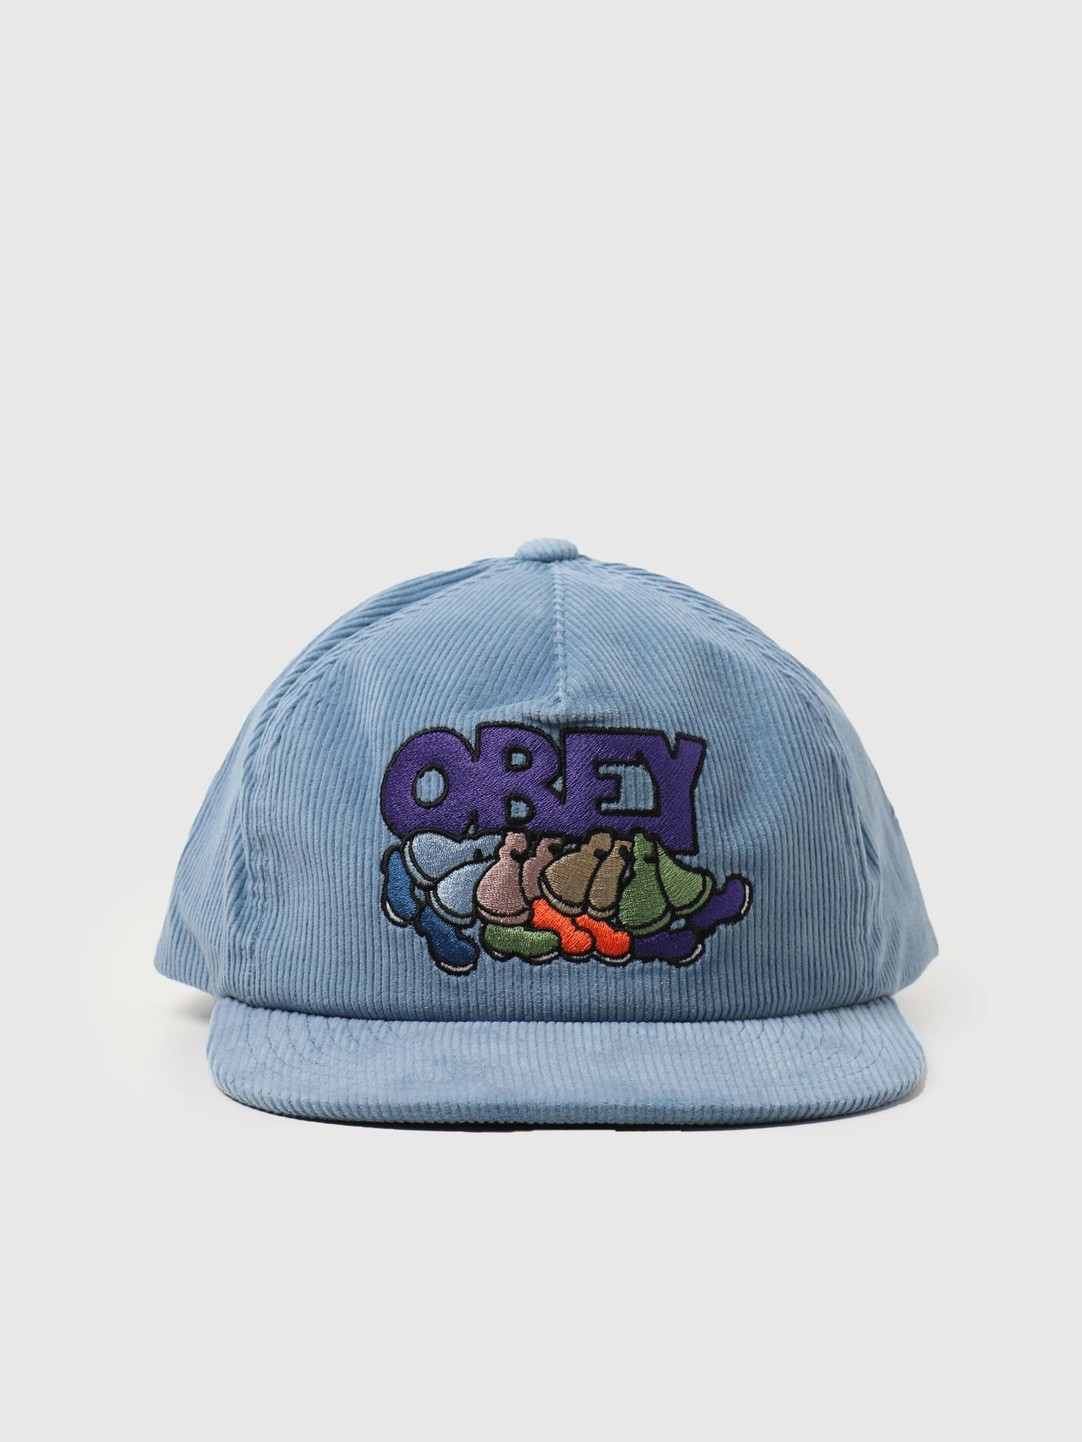 Obey Obey Roadrunner Snapback Blue Sky 100580282-SKY